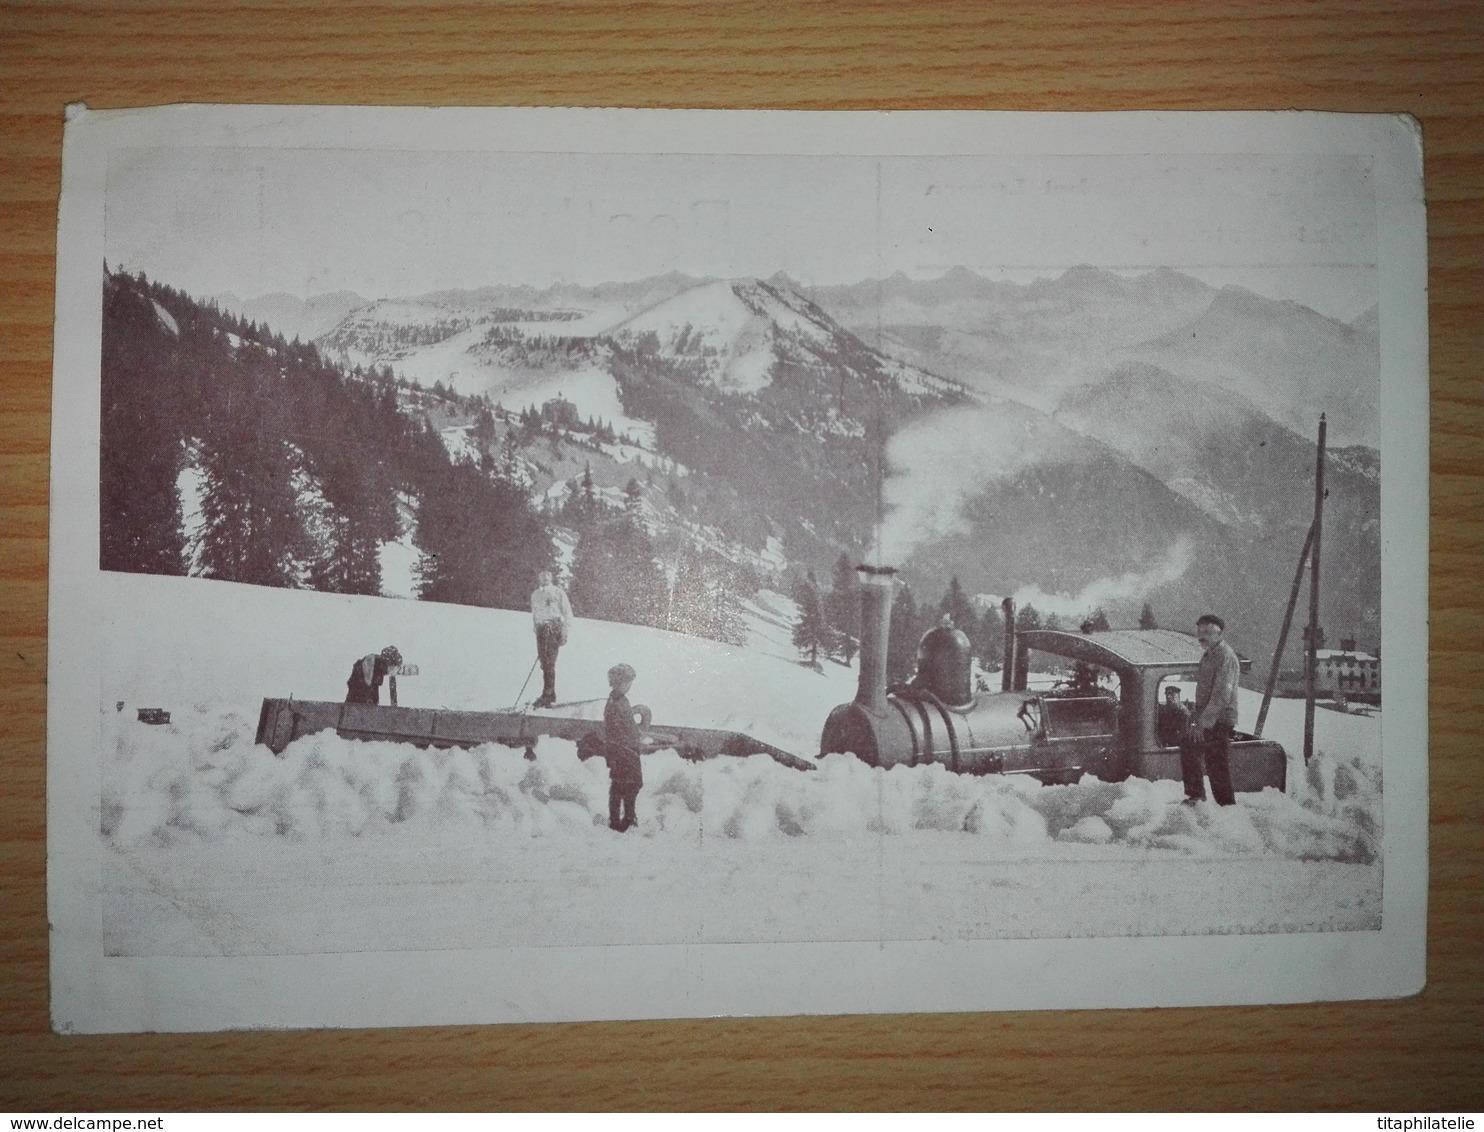 CPA Carte Postale CP Suisse Rigi Bahn Bei Luzern Winterbetrieb Wintersport Train Locomotive Neige Belle Animation - LU Lucerne